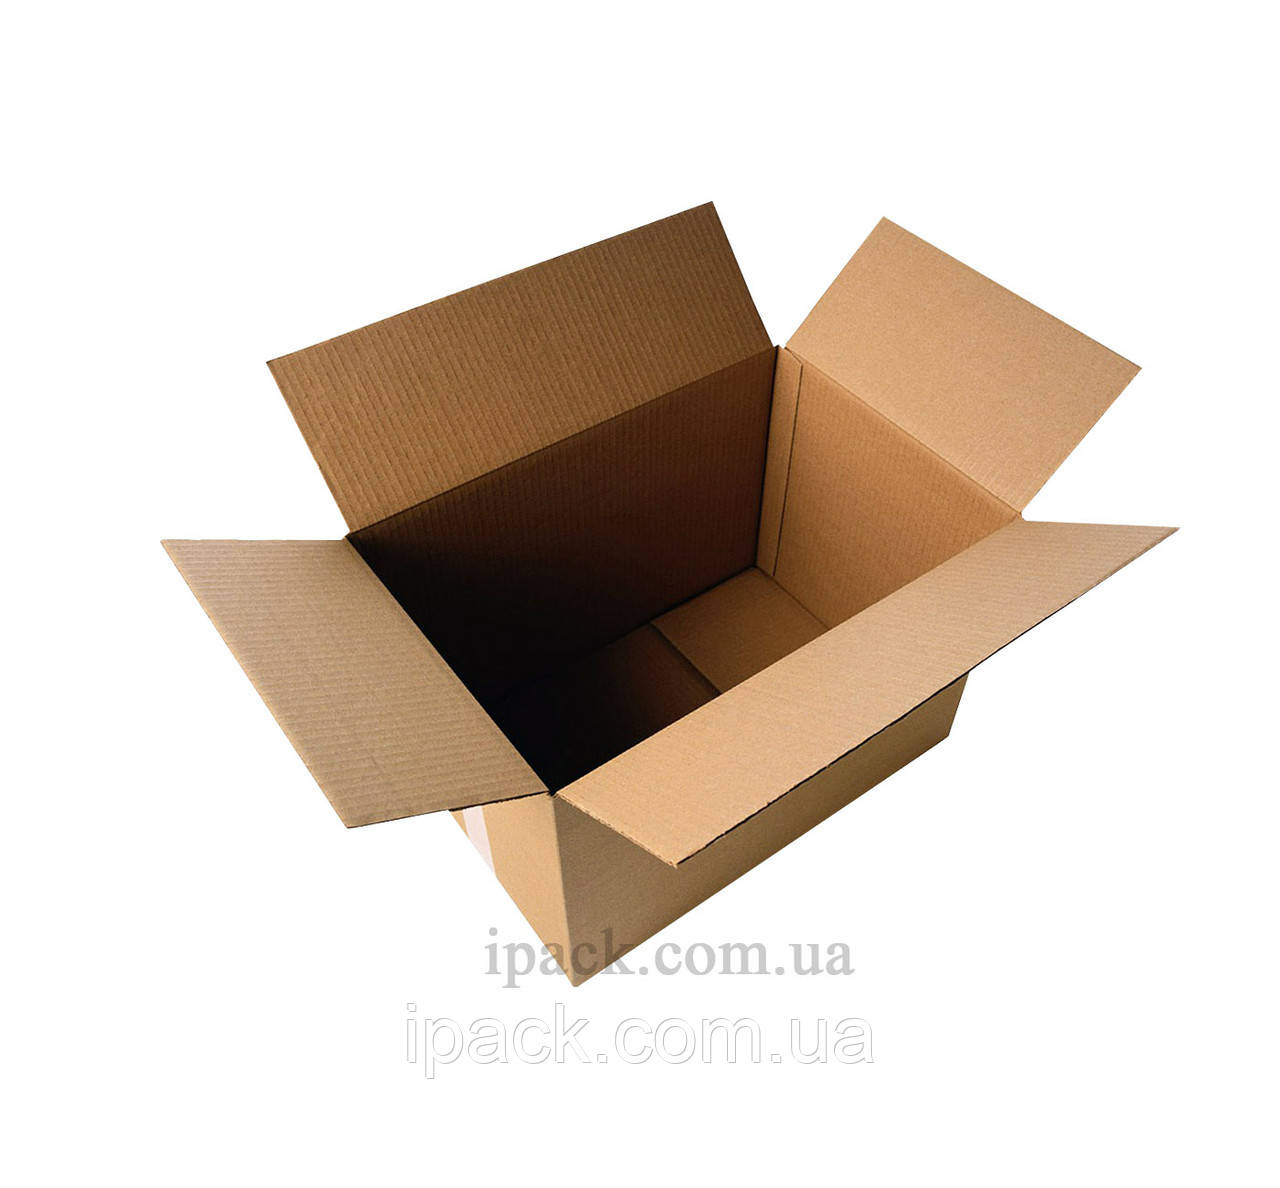 Гофроящик 465*260*380 мм, бурый, четырехклапанный картонный короб